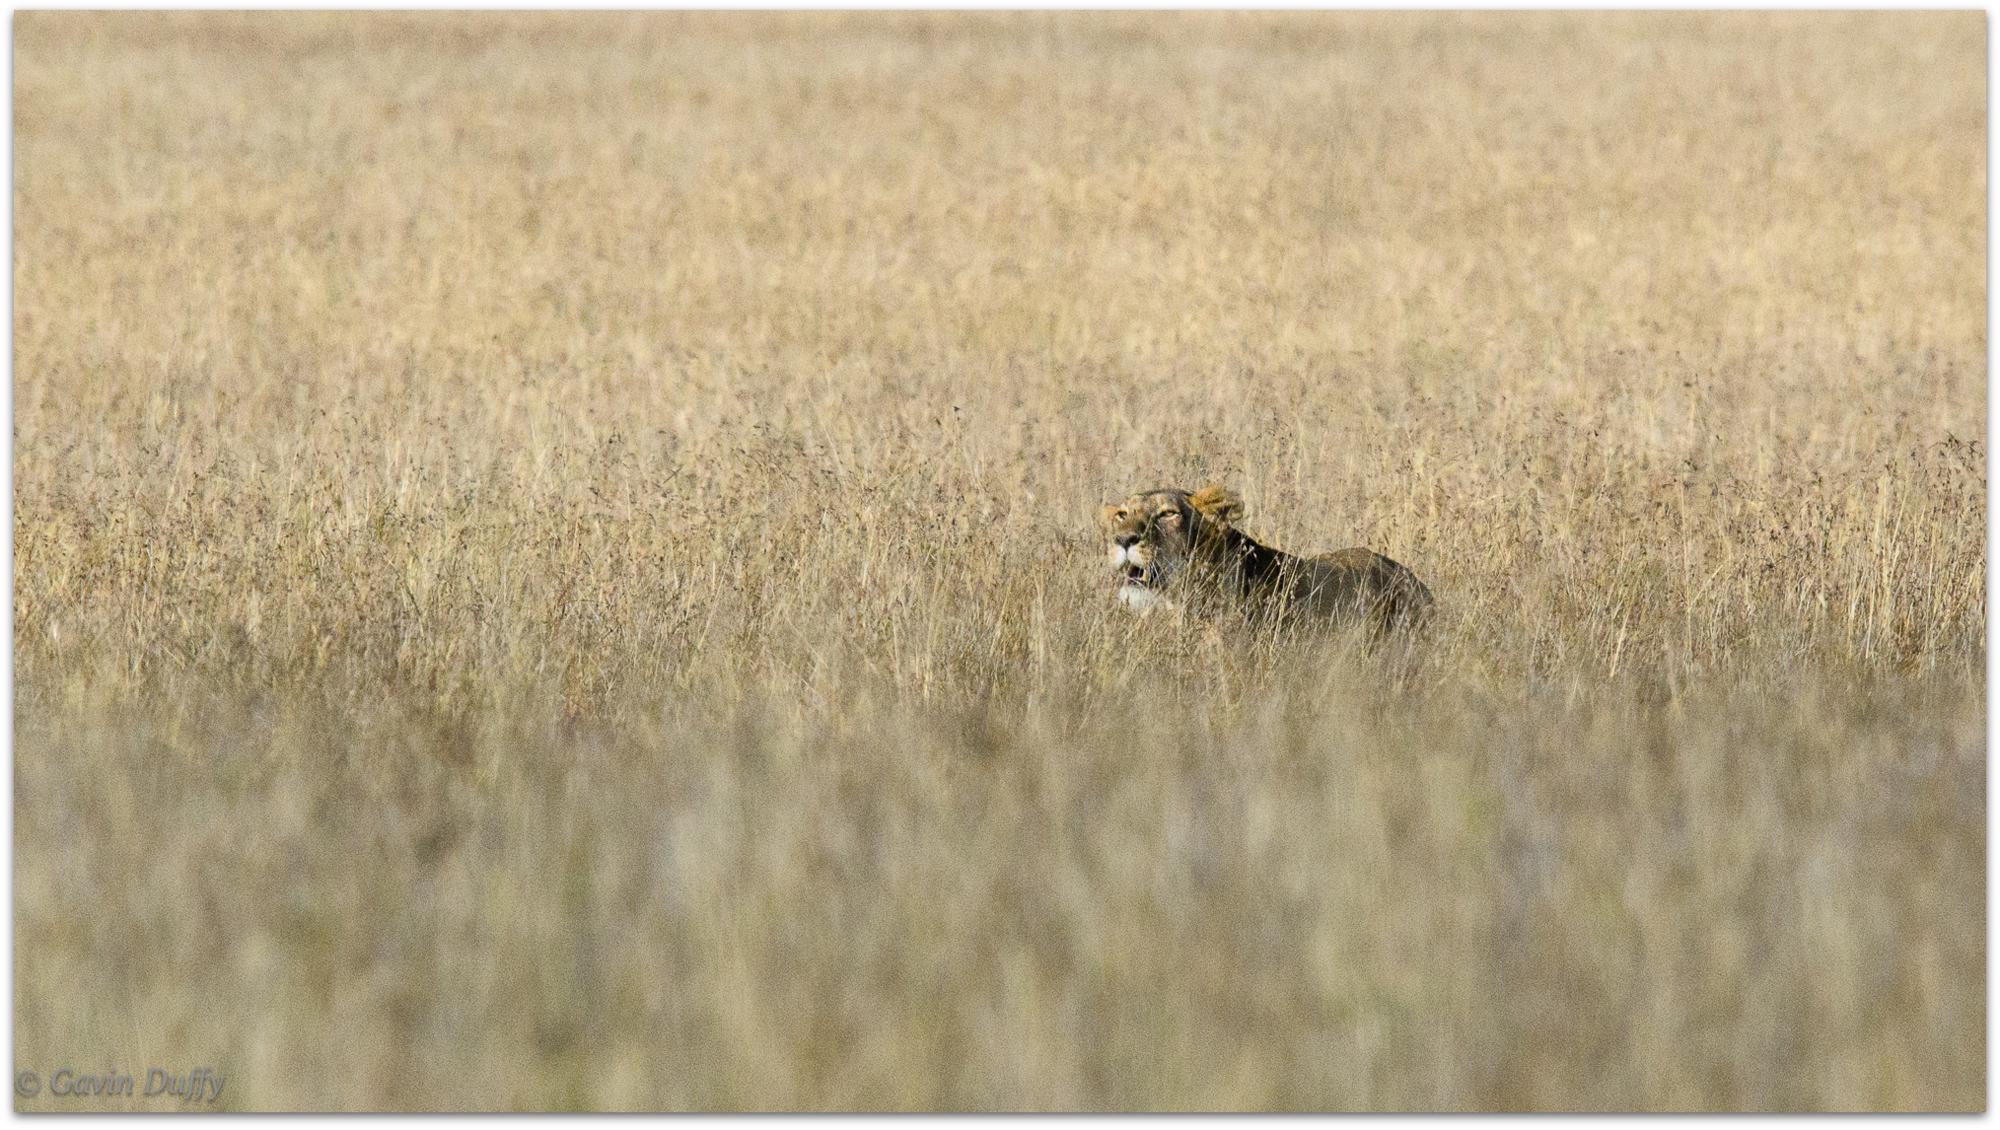 Lioness stalking prey © Gavin Duffy